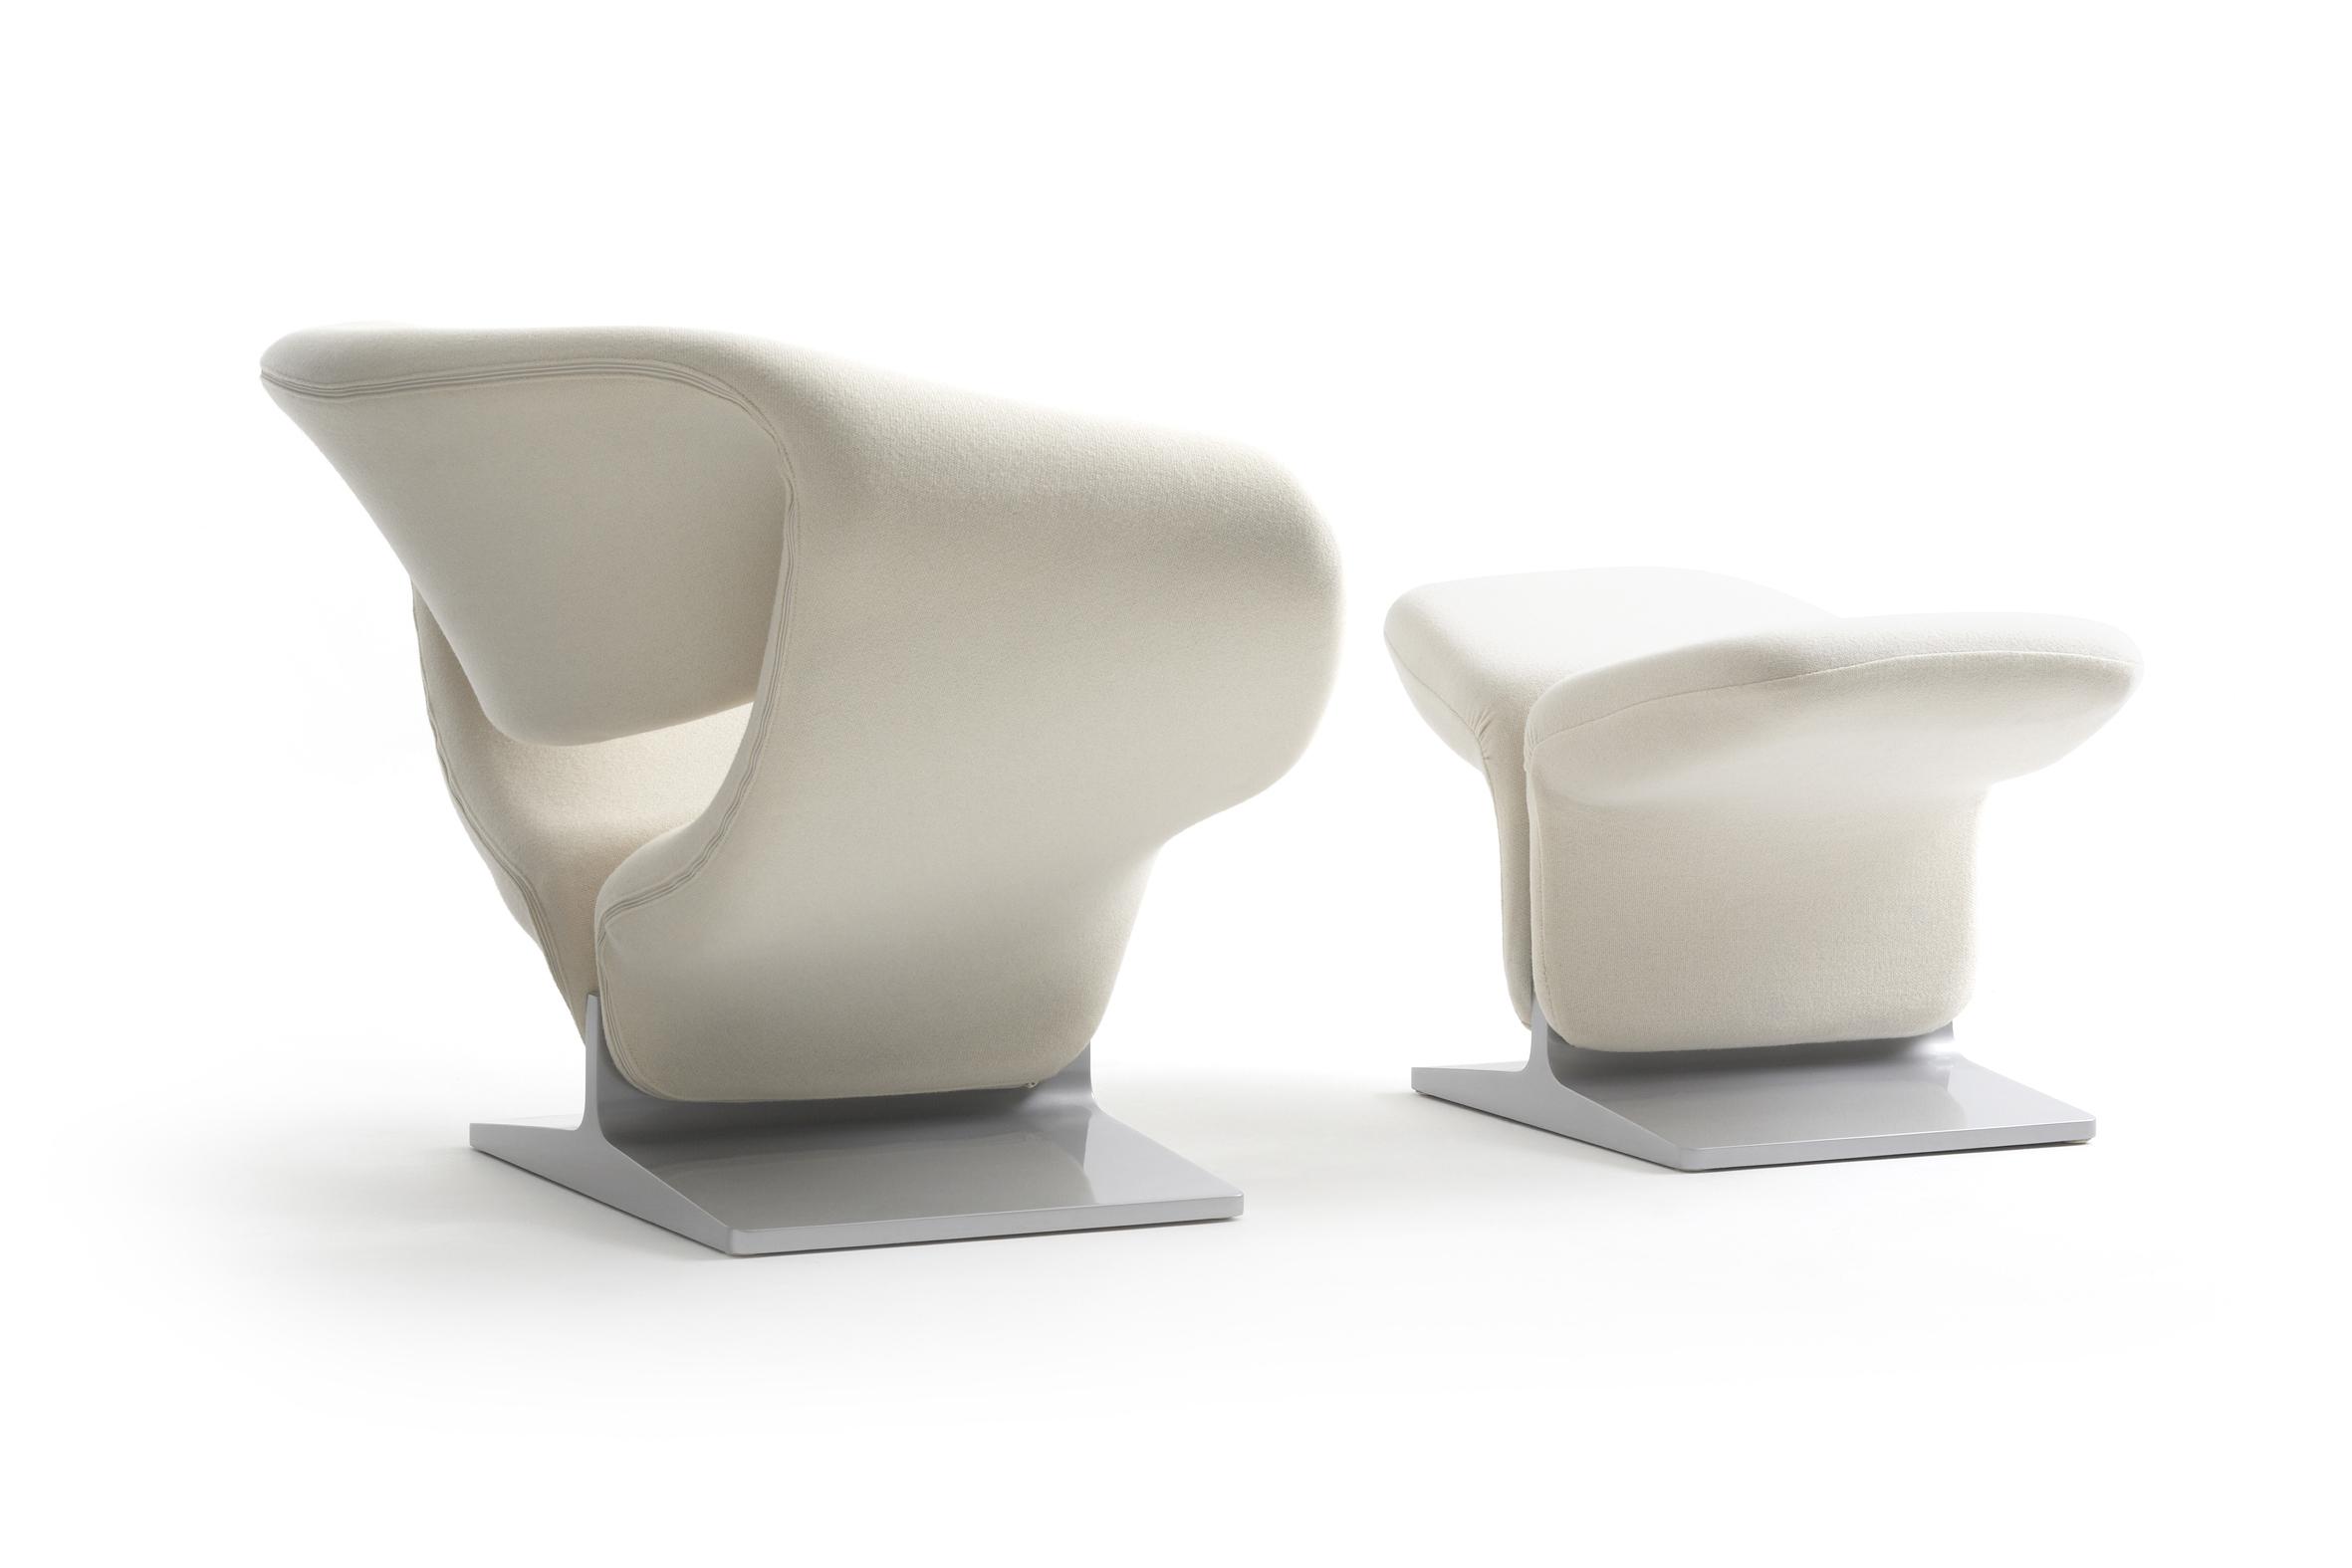 The Pierre Paulin ribbon chair by Artifort